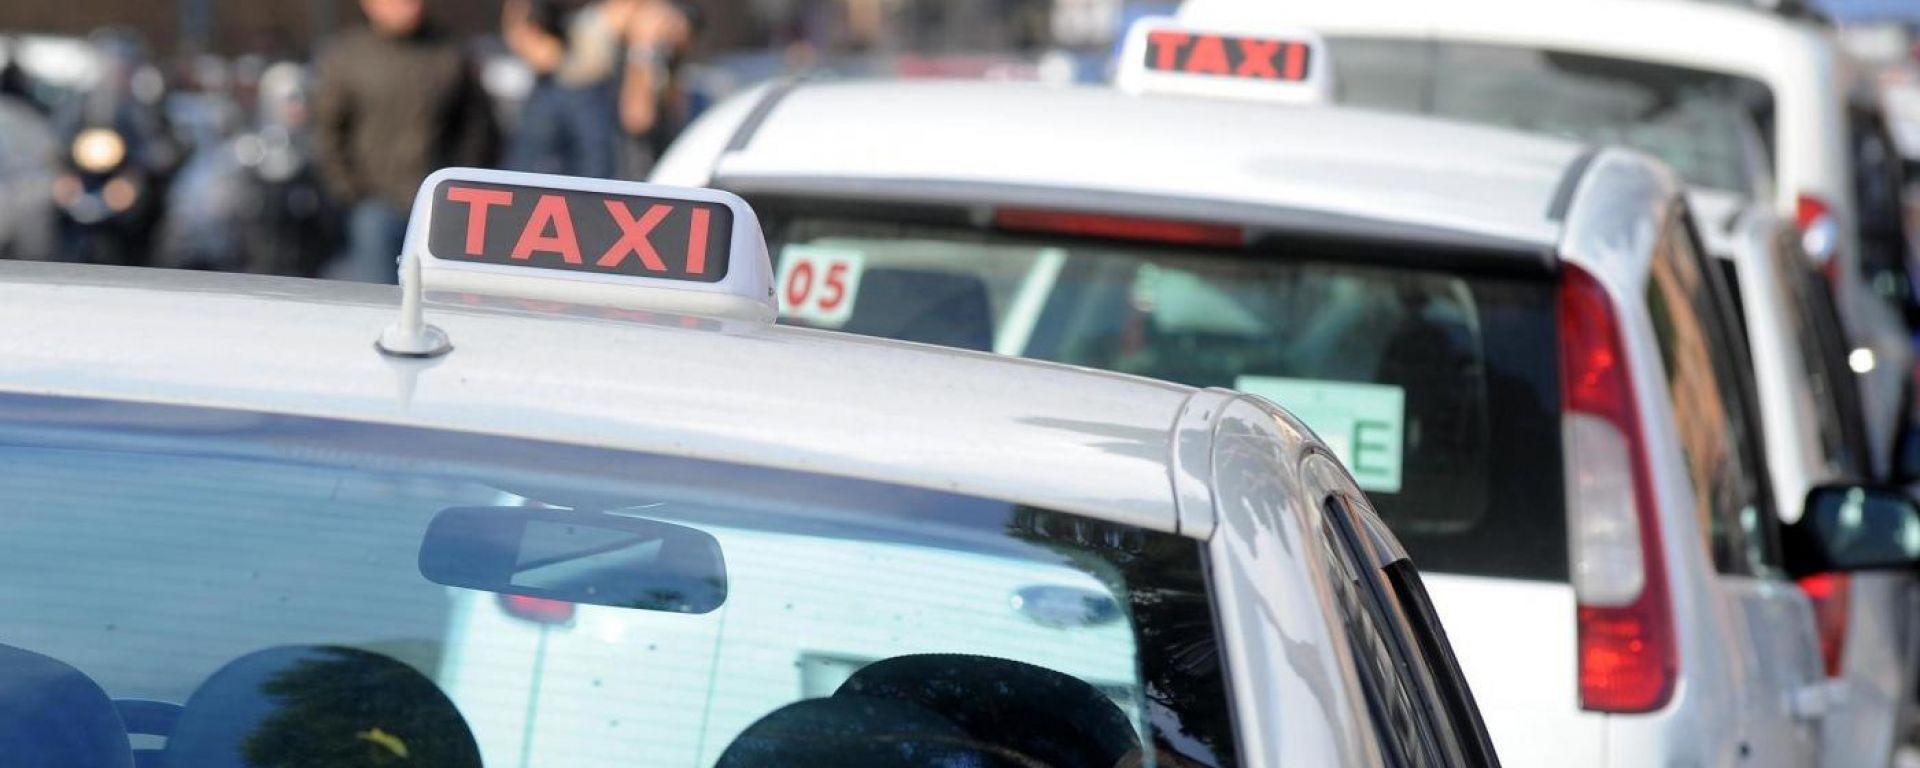 Taxi, arriva il bonus